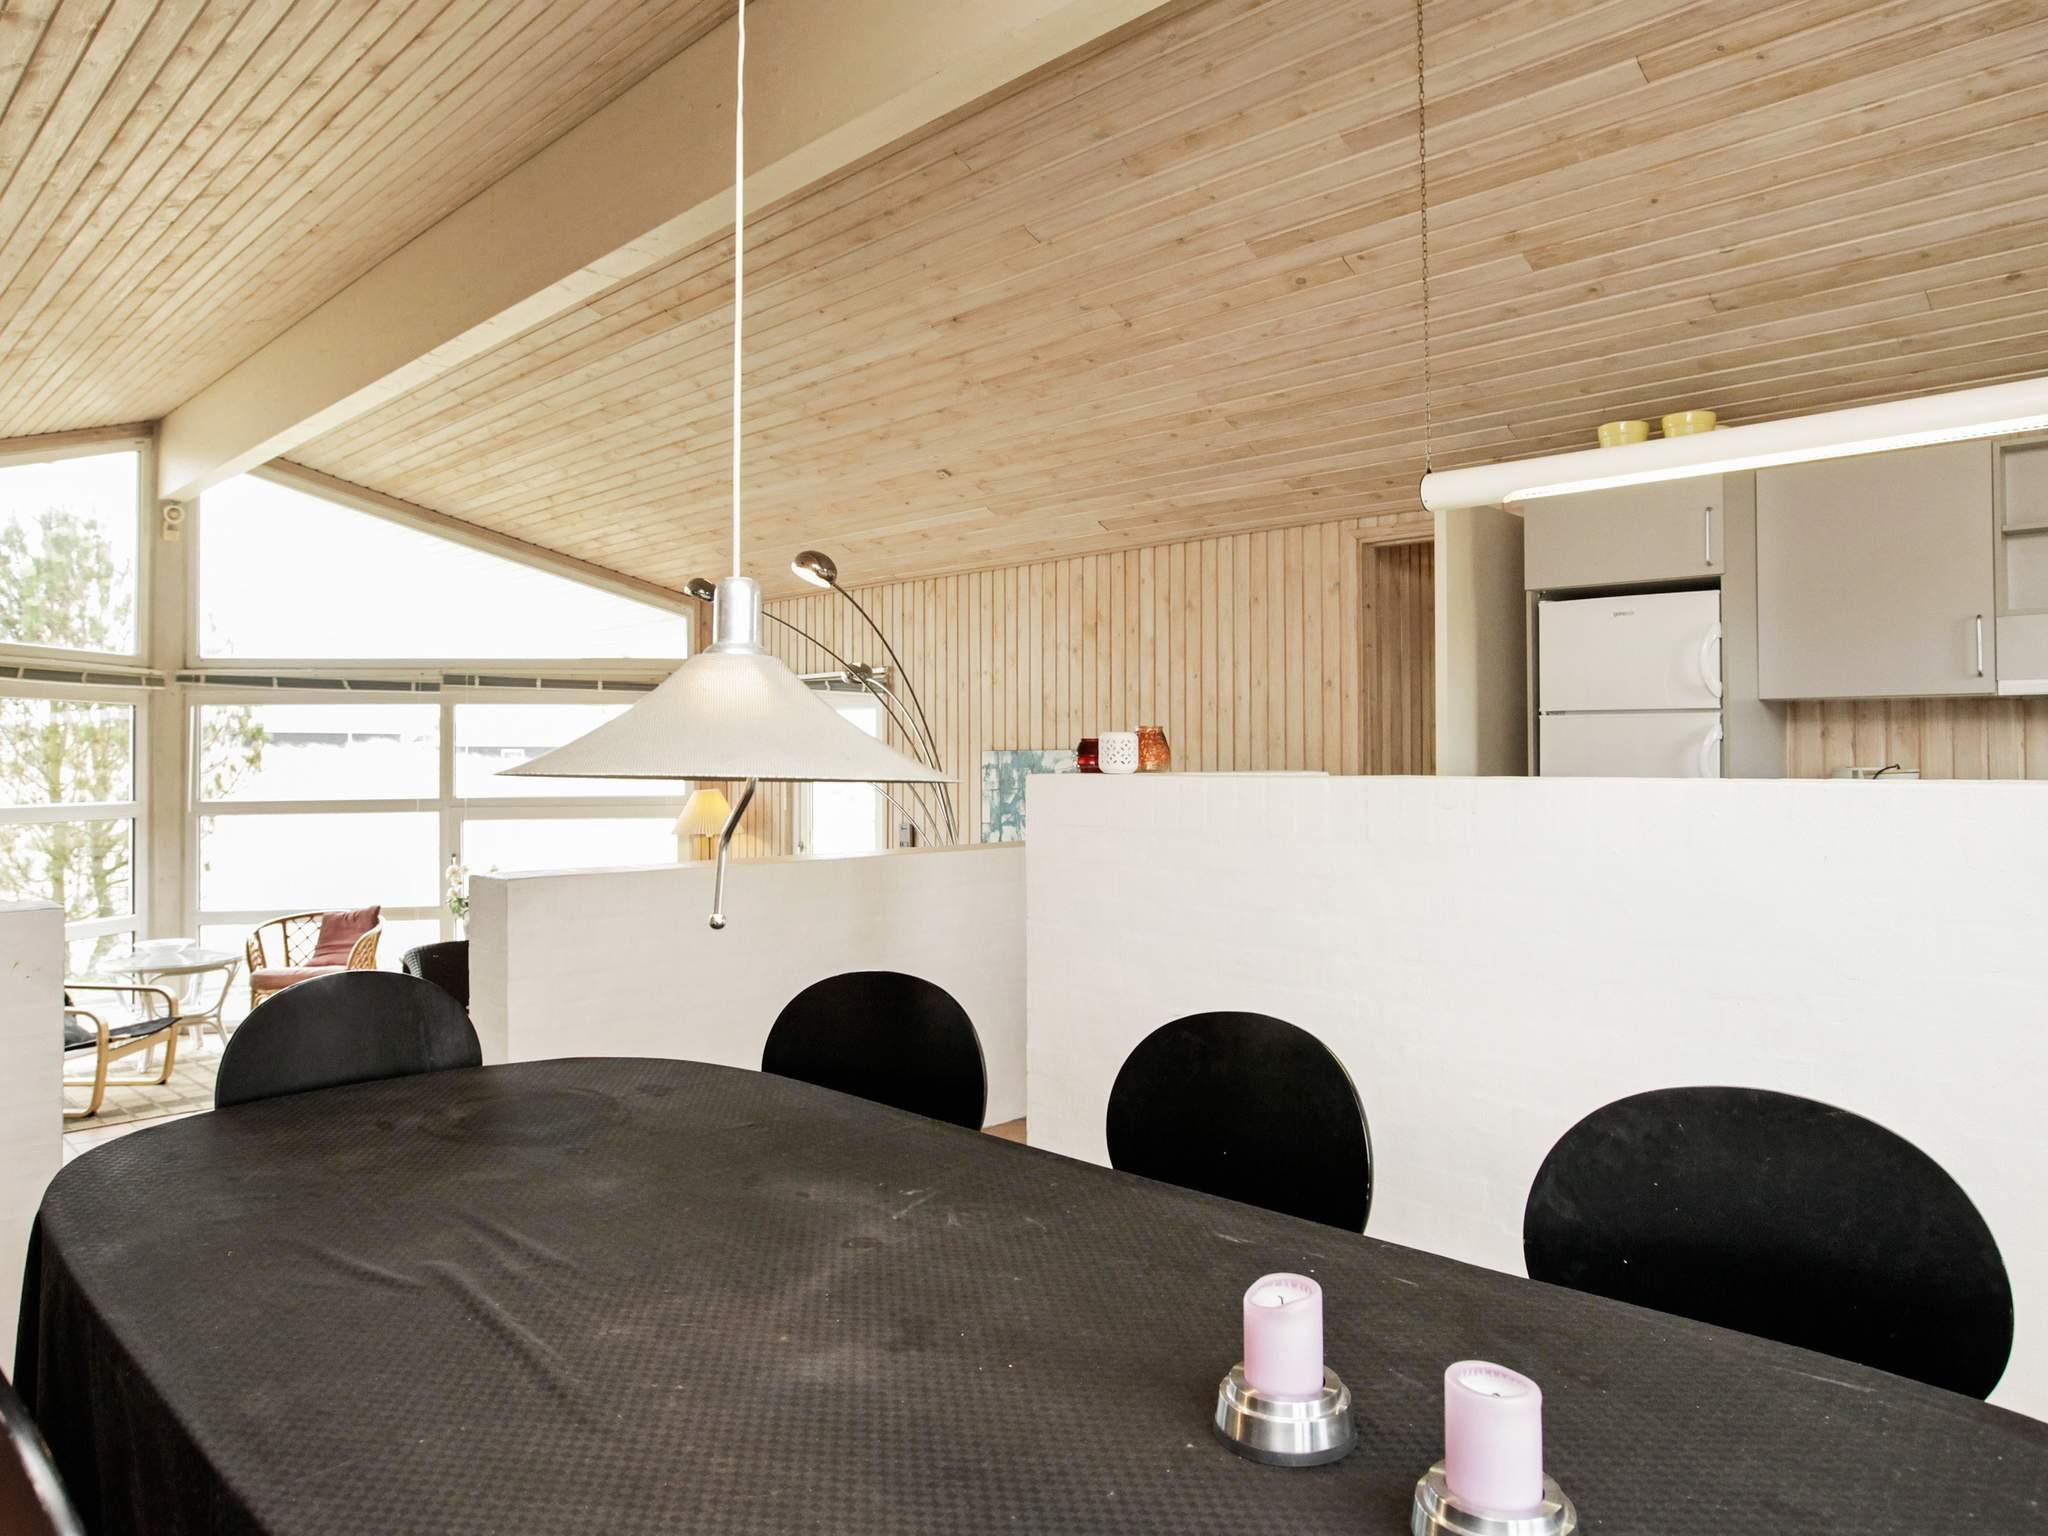 Ferienhaus Tversted (82208), Tversted, , Nordwestjütland, Dänemark, Bild 3